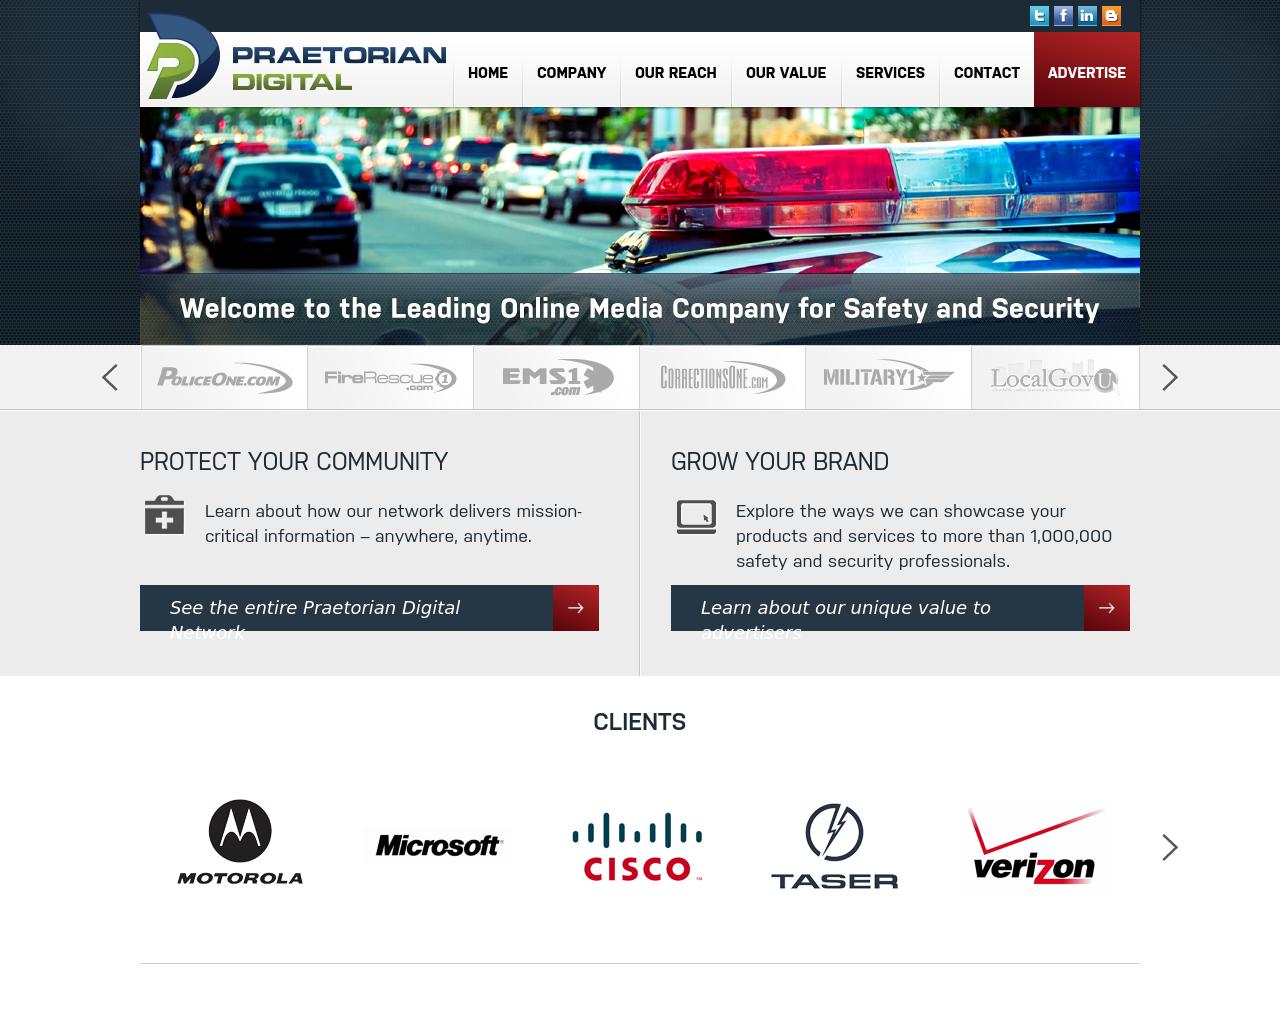 Praetorian-Group-Advertising-Reviews-Pricing